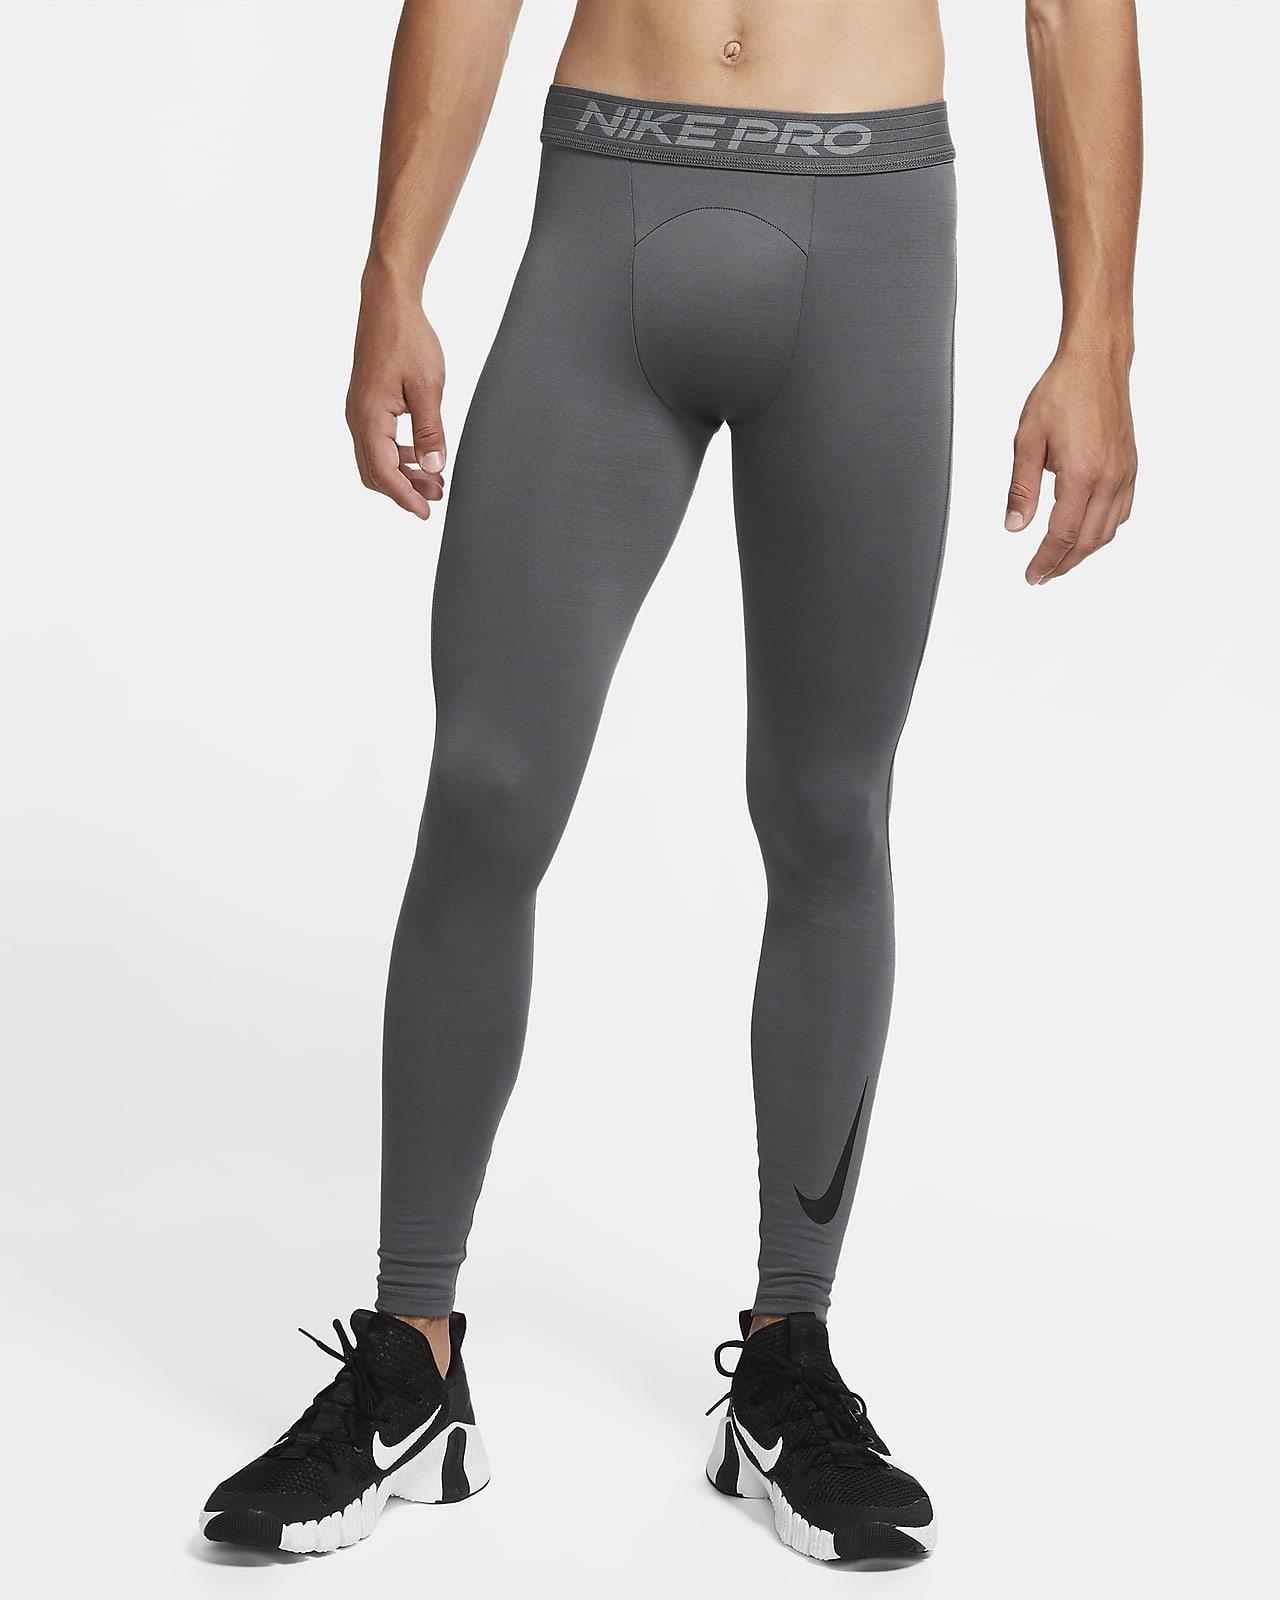 Nike Pro Warm Men's Tights